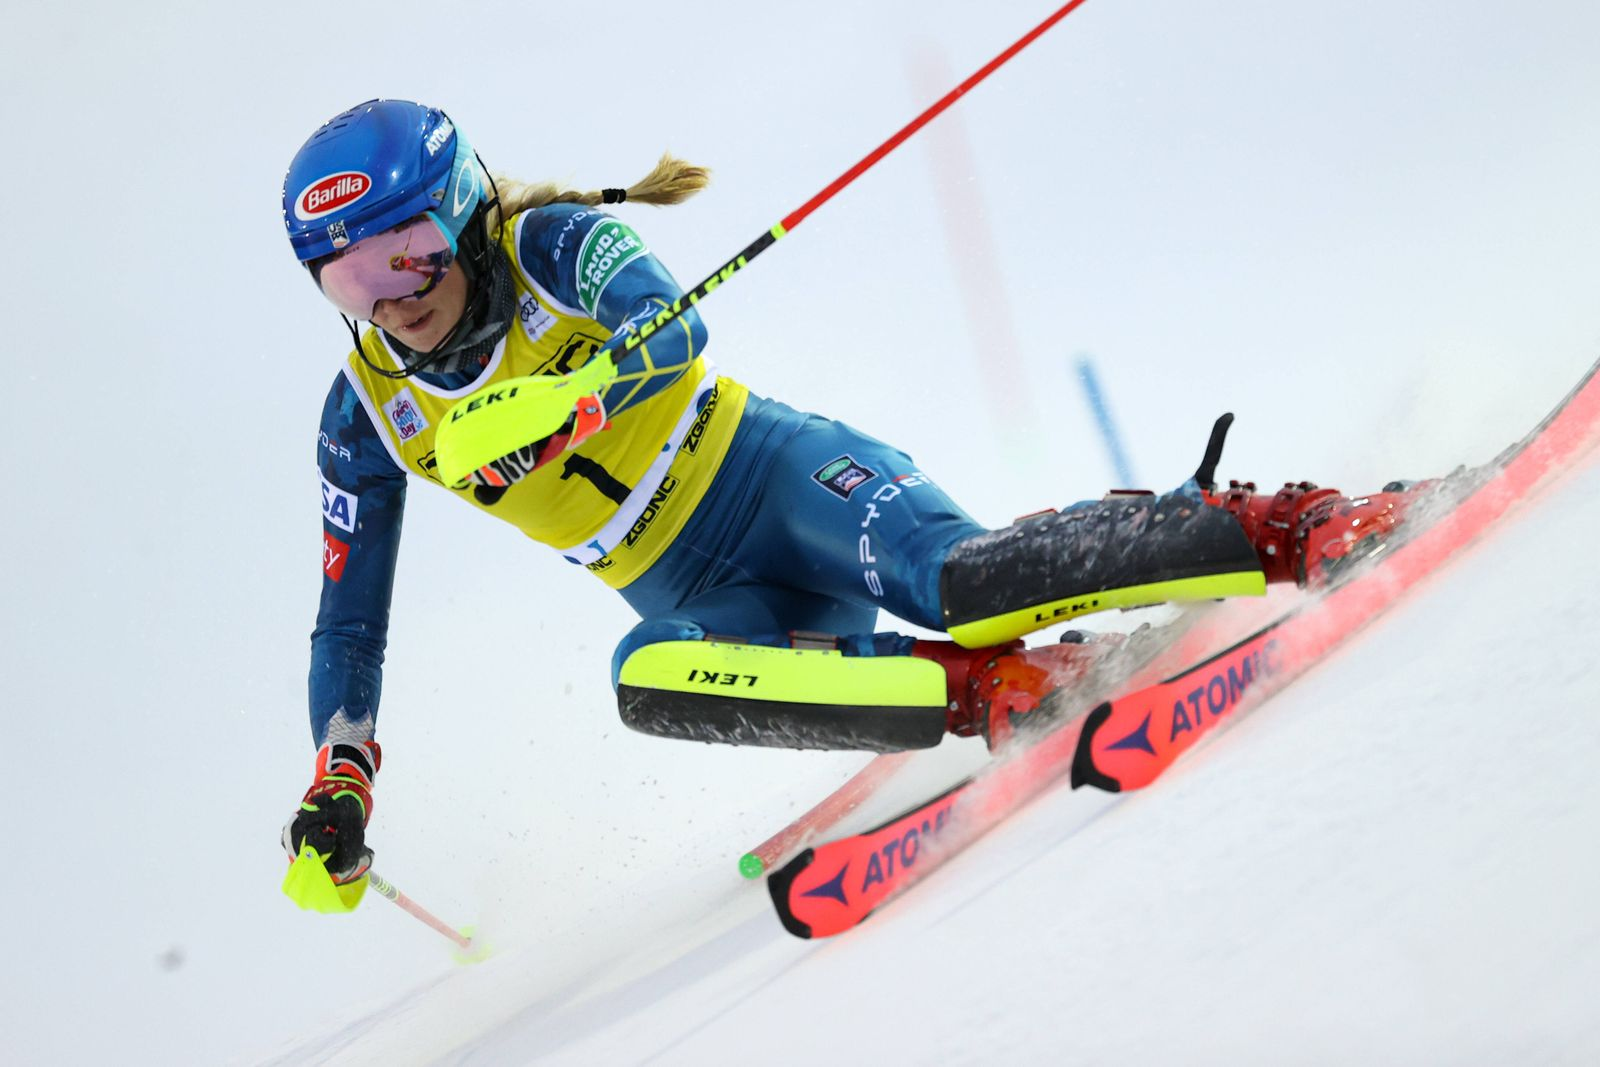 ALPINE SKIING - FIS WC Levi LEVI,FINLAND,21.NOV.20 - ALPINE SKIING - FIS World Cup, slalom, ladies. Image shows Mikaela